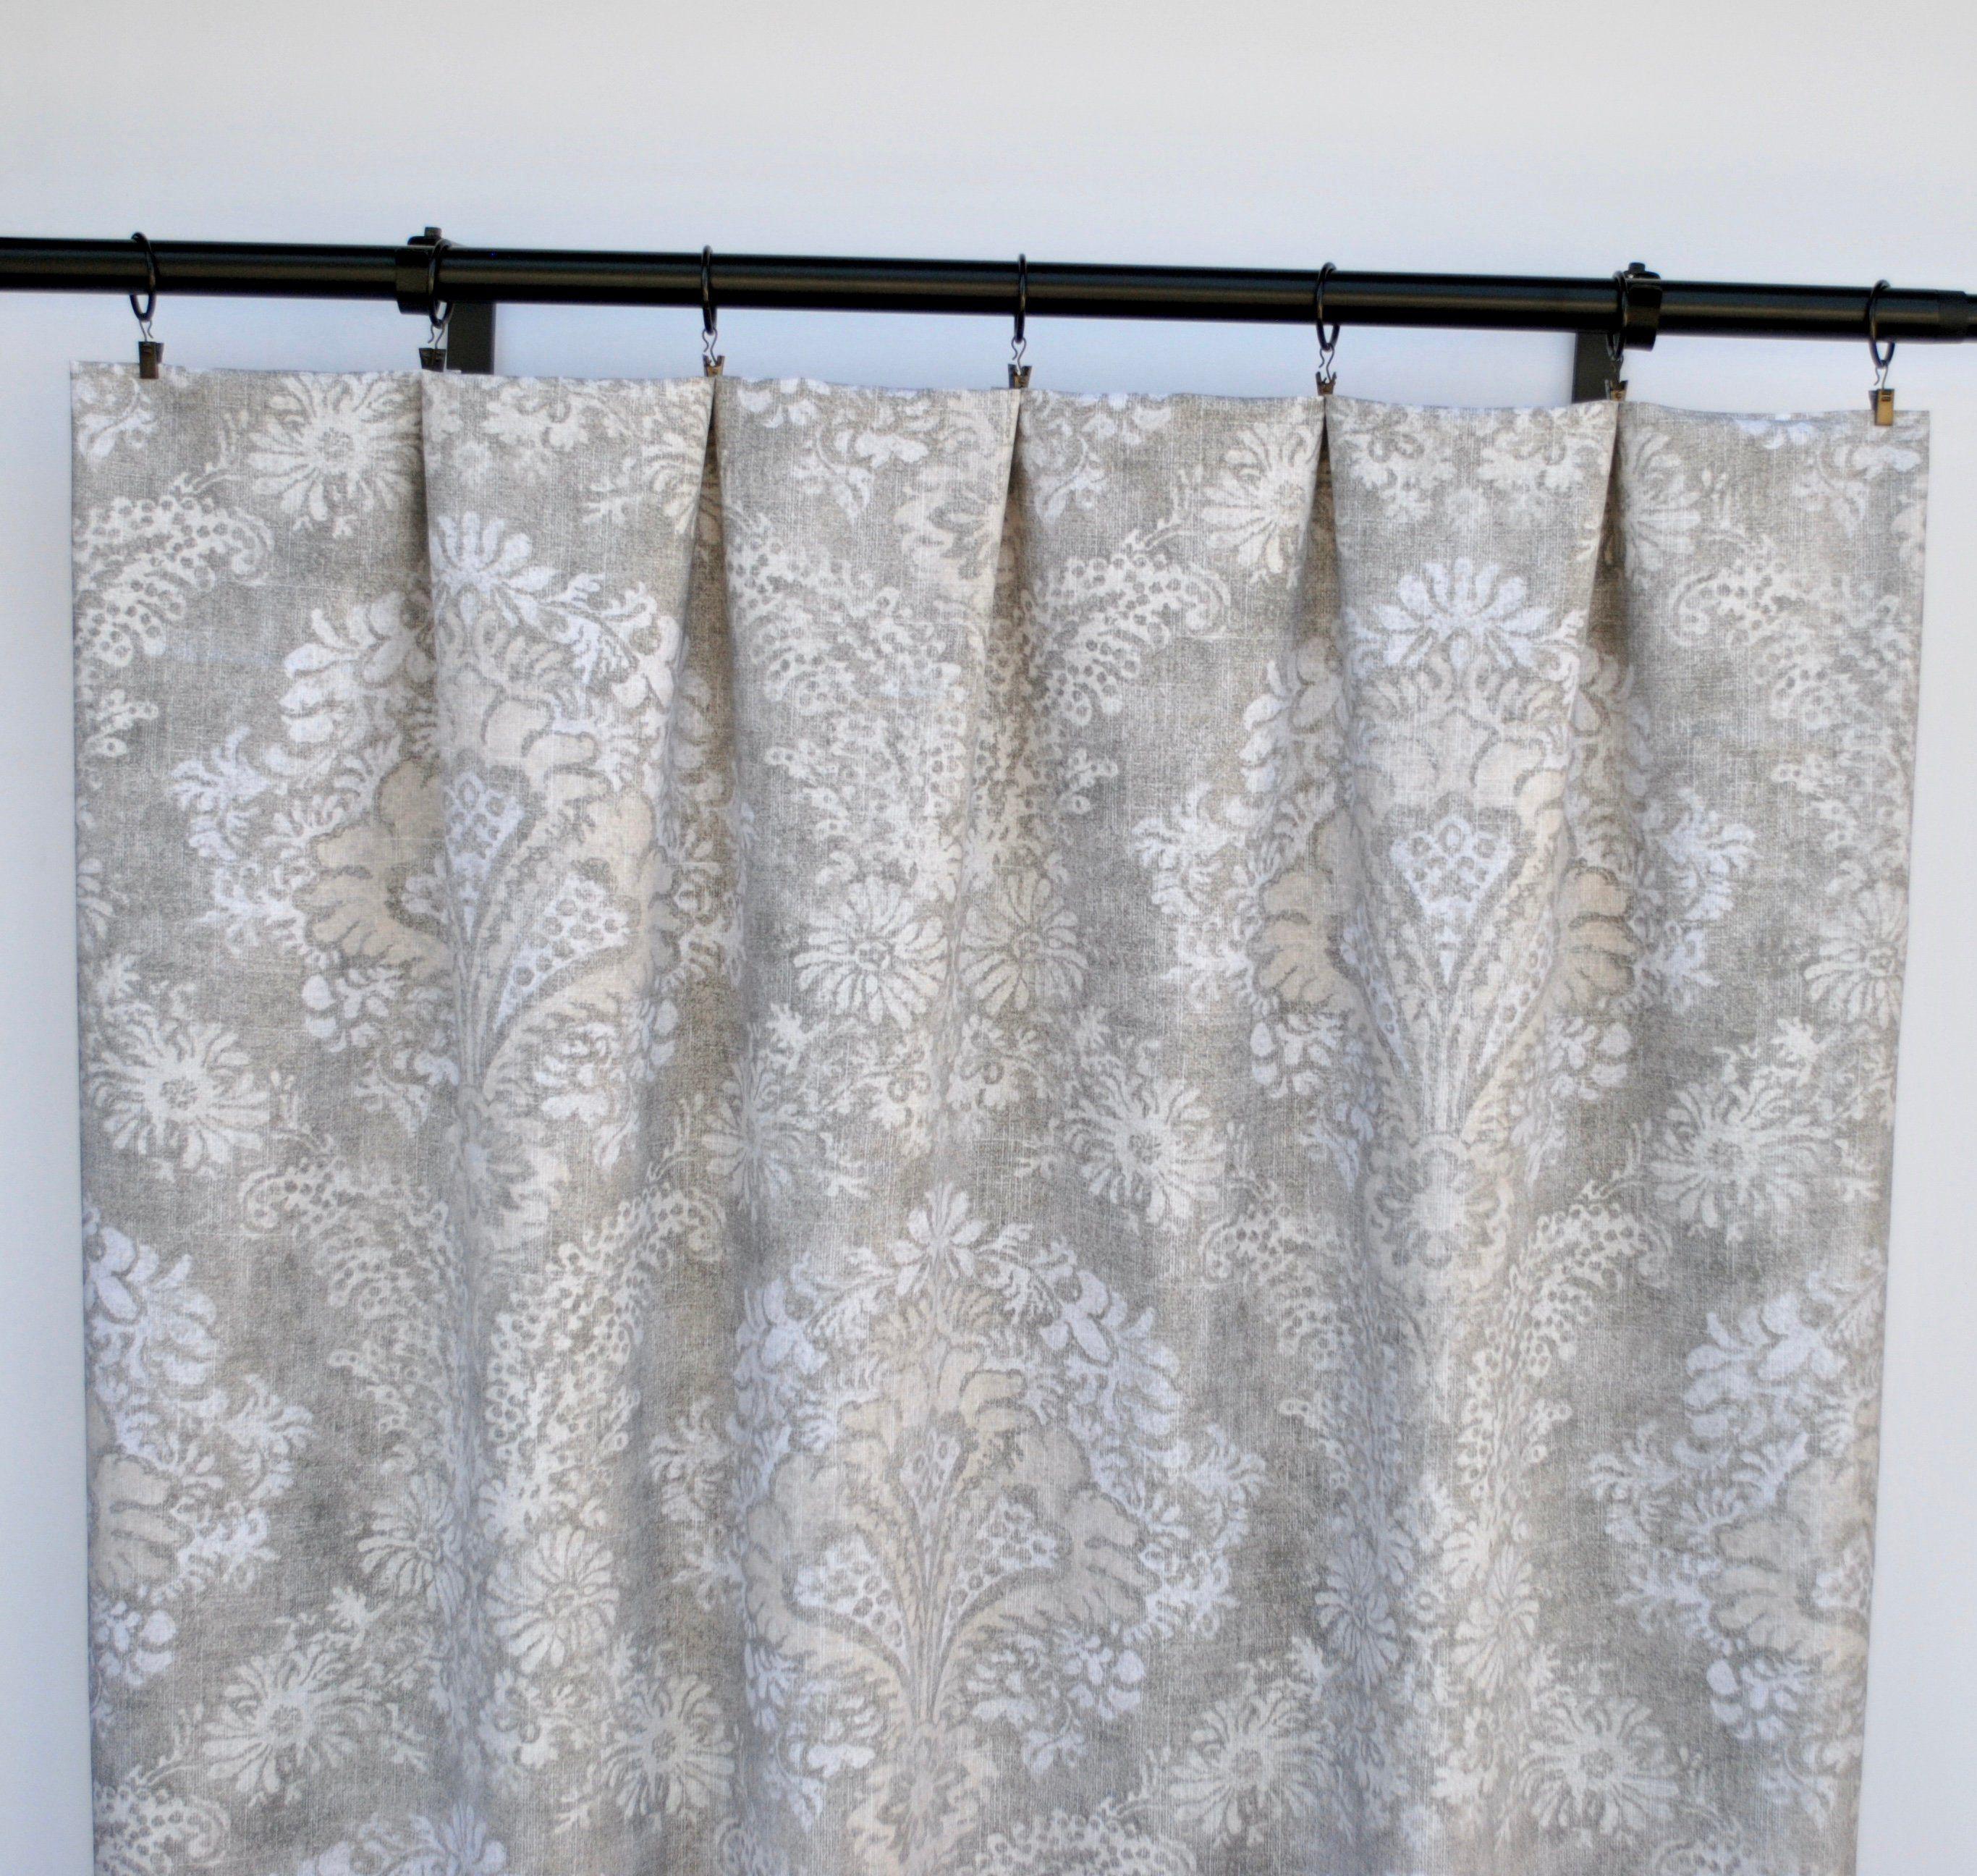 Magnolia Curtains Floral Curtain Grey Curtain 2 Curtain Panels Curtains Home Decor Tan Curtain In 2020 Beige Curtains Grey Curtains Floral Curtains #tan #curtains #for #living #room